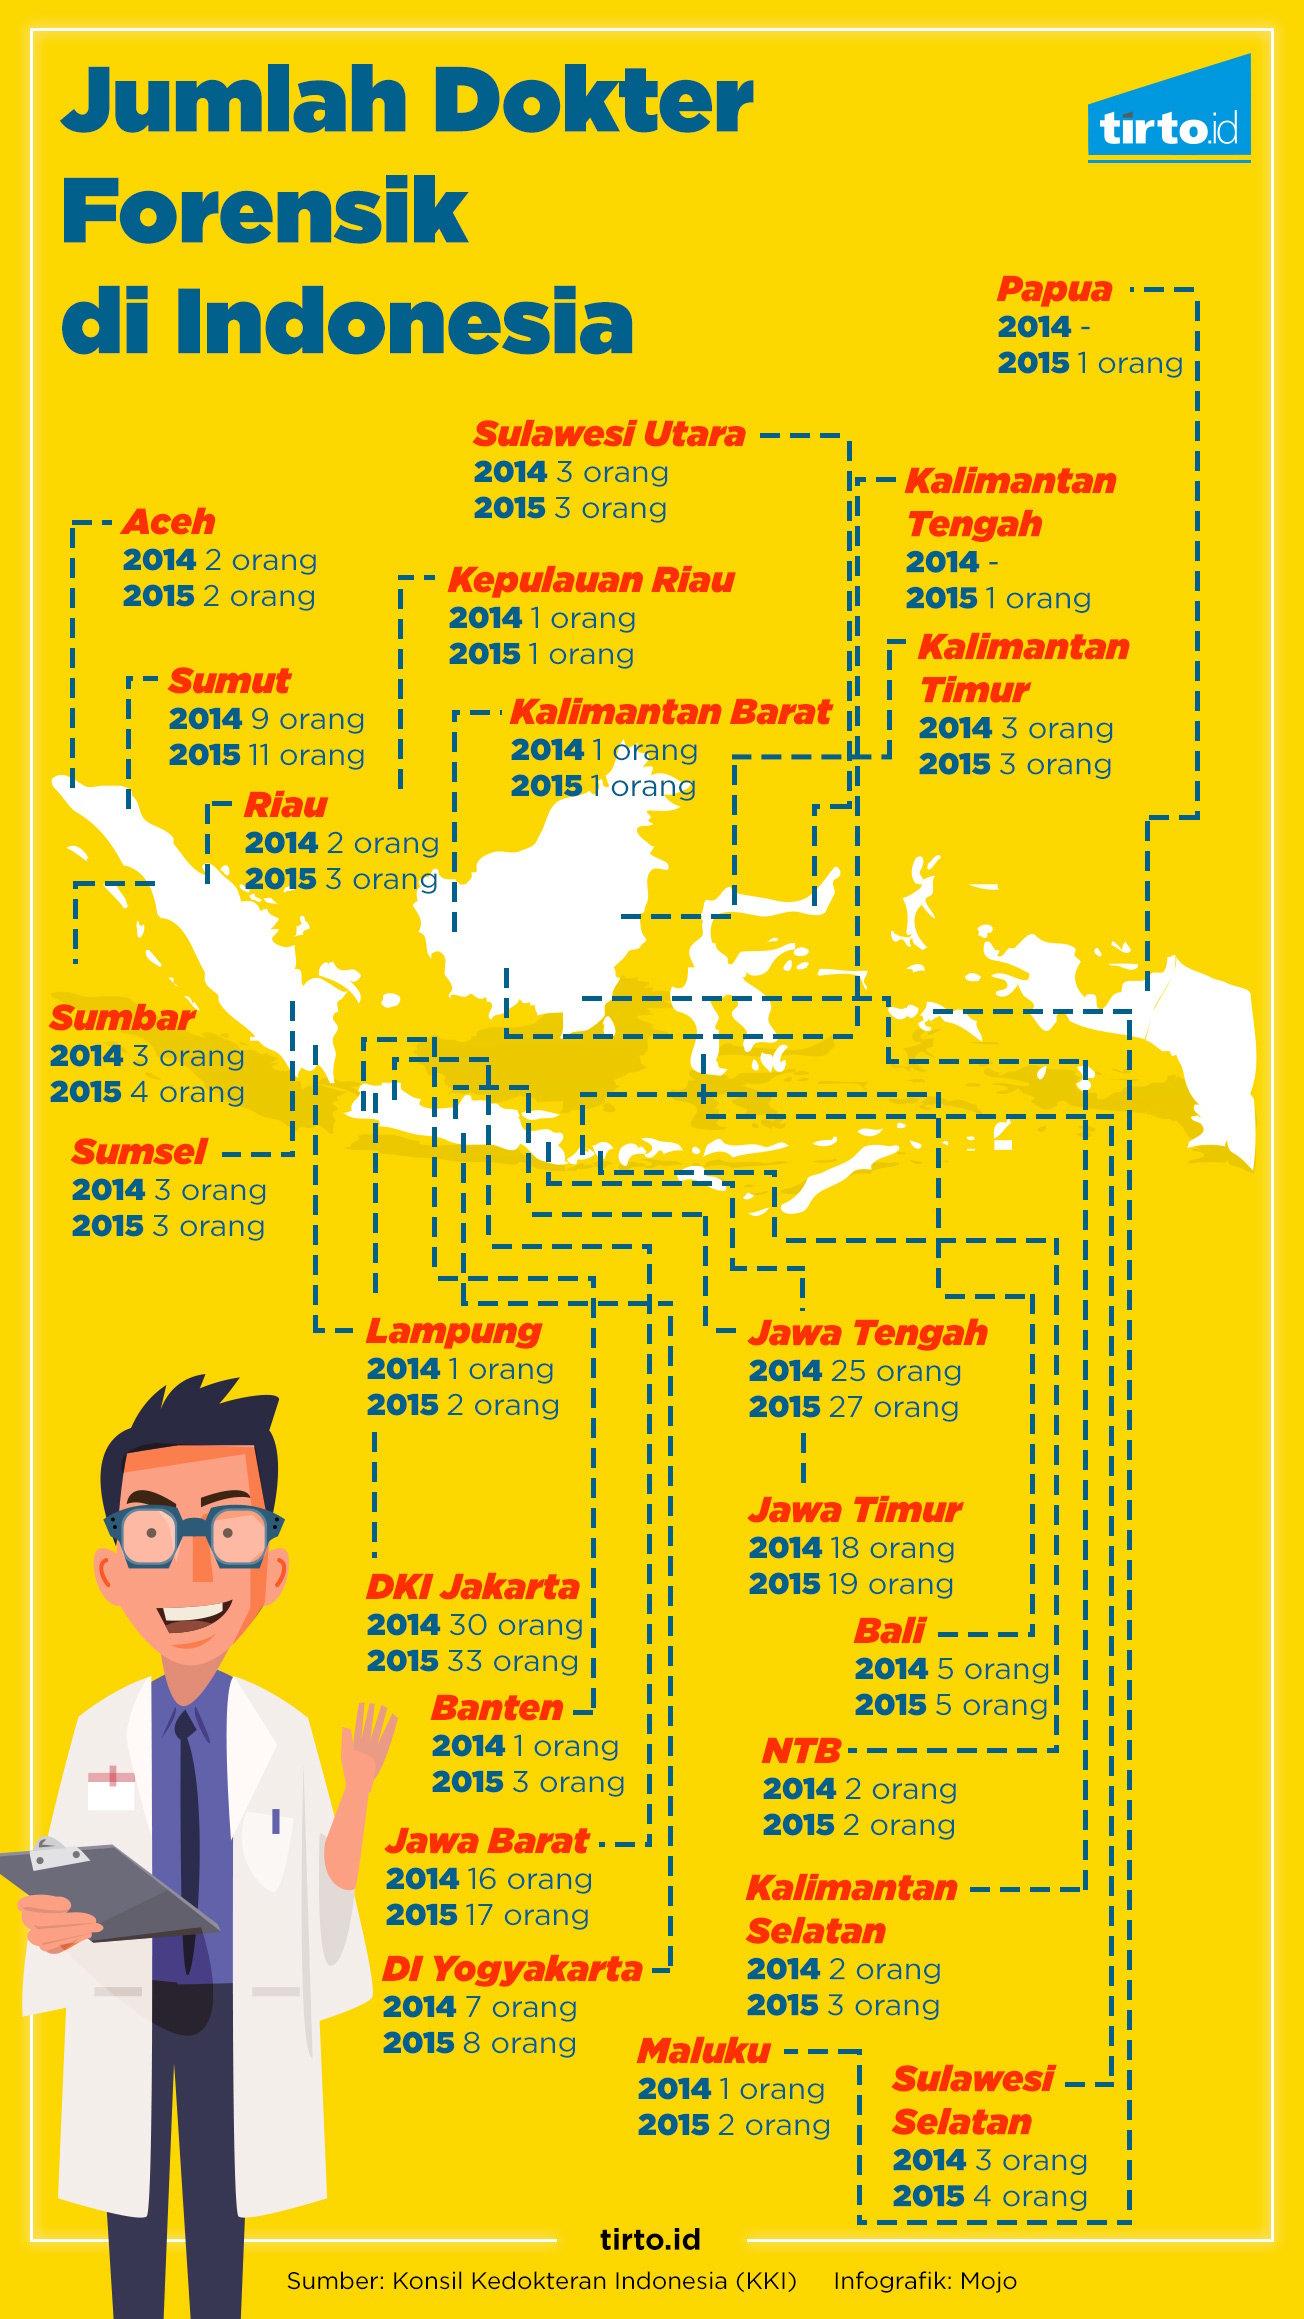 Indonesia Krisis Dokter Forensik Tirto Id